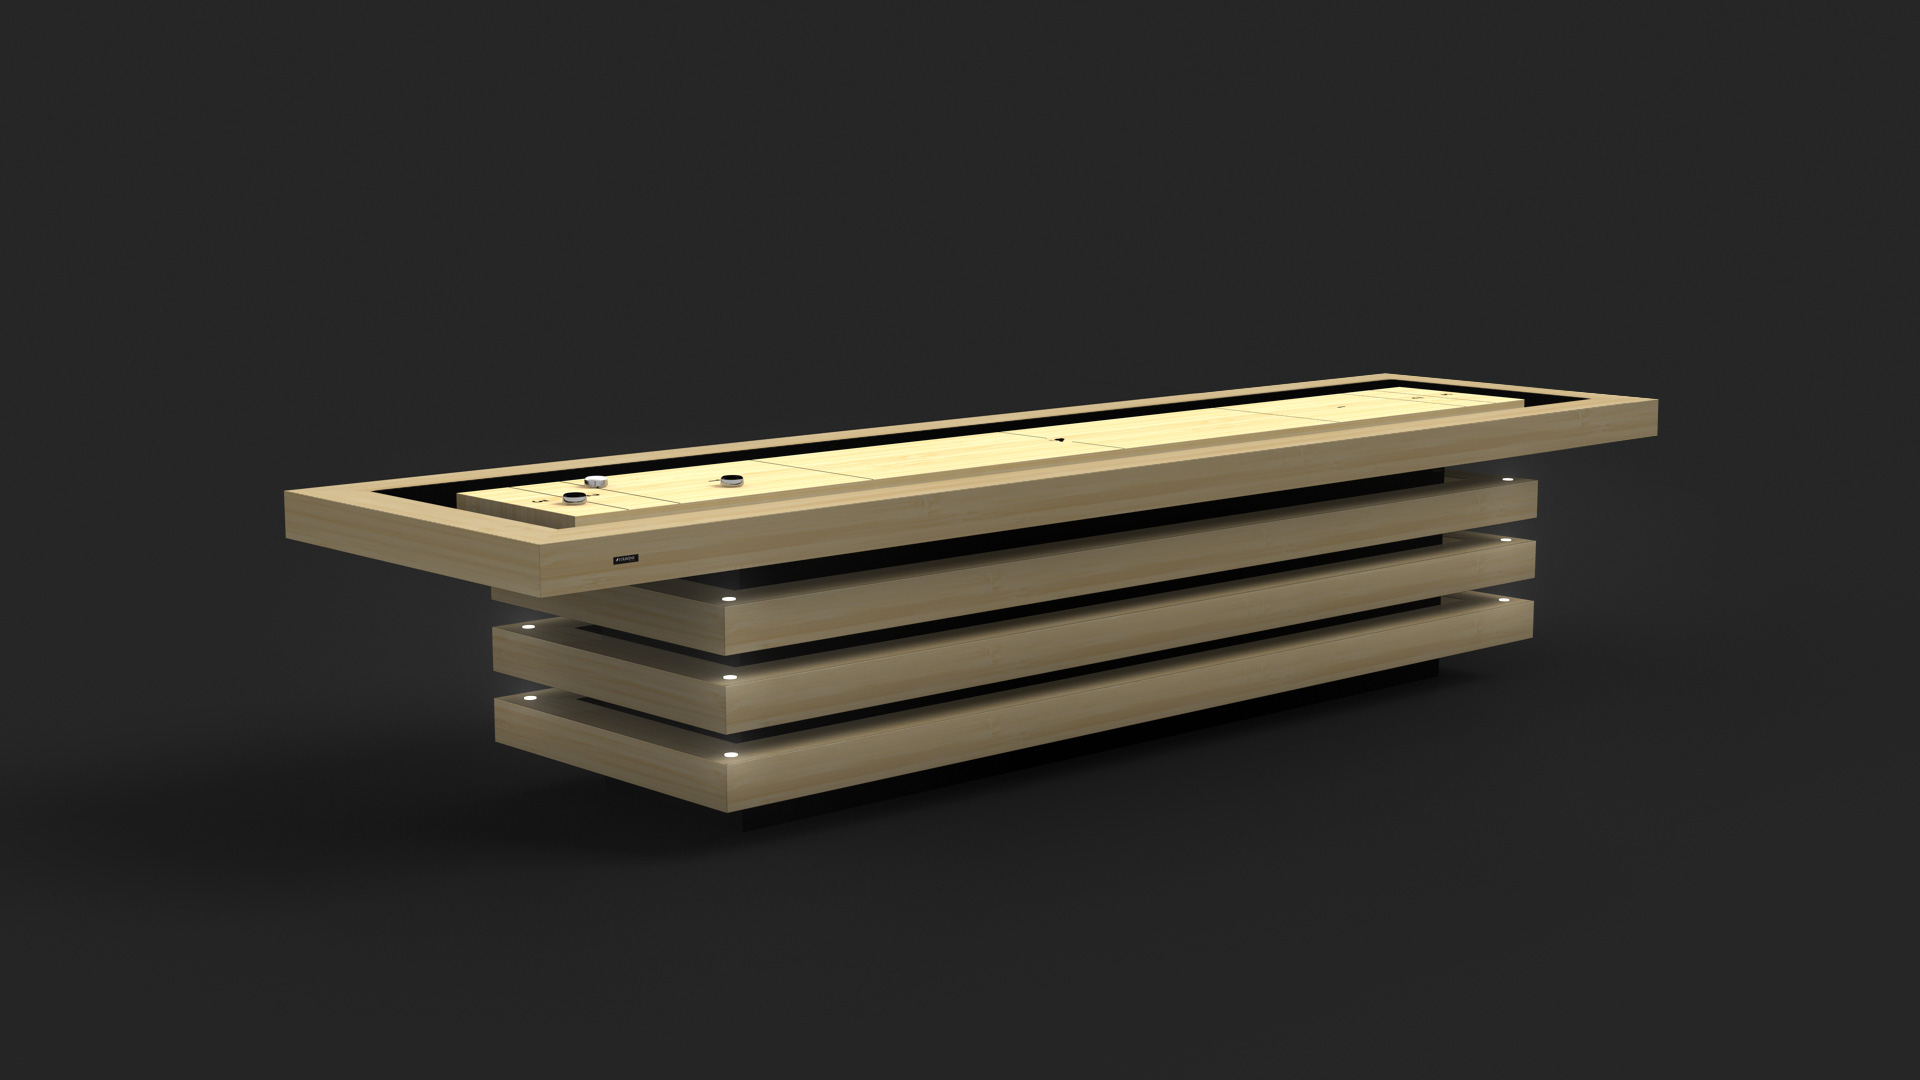 11Ravens Shuffleboard Tables | 11 RAVENS Luxury Games